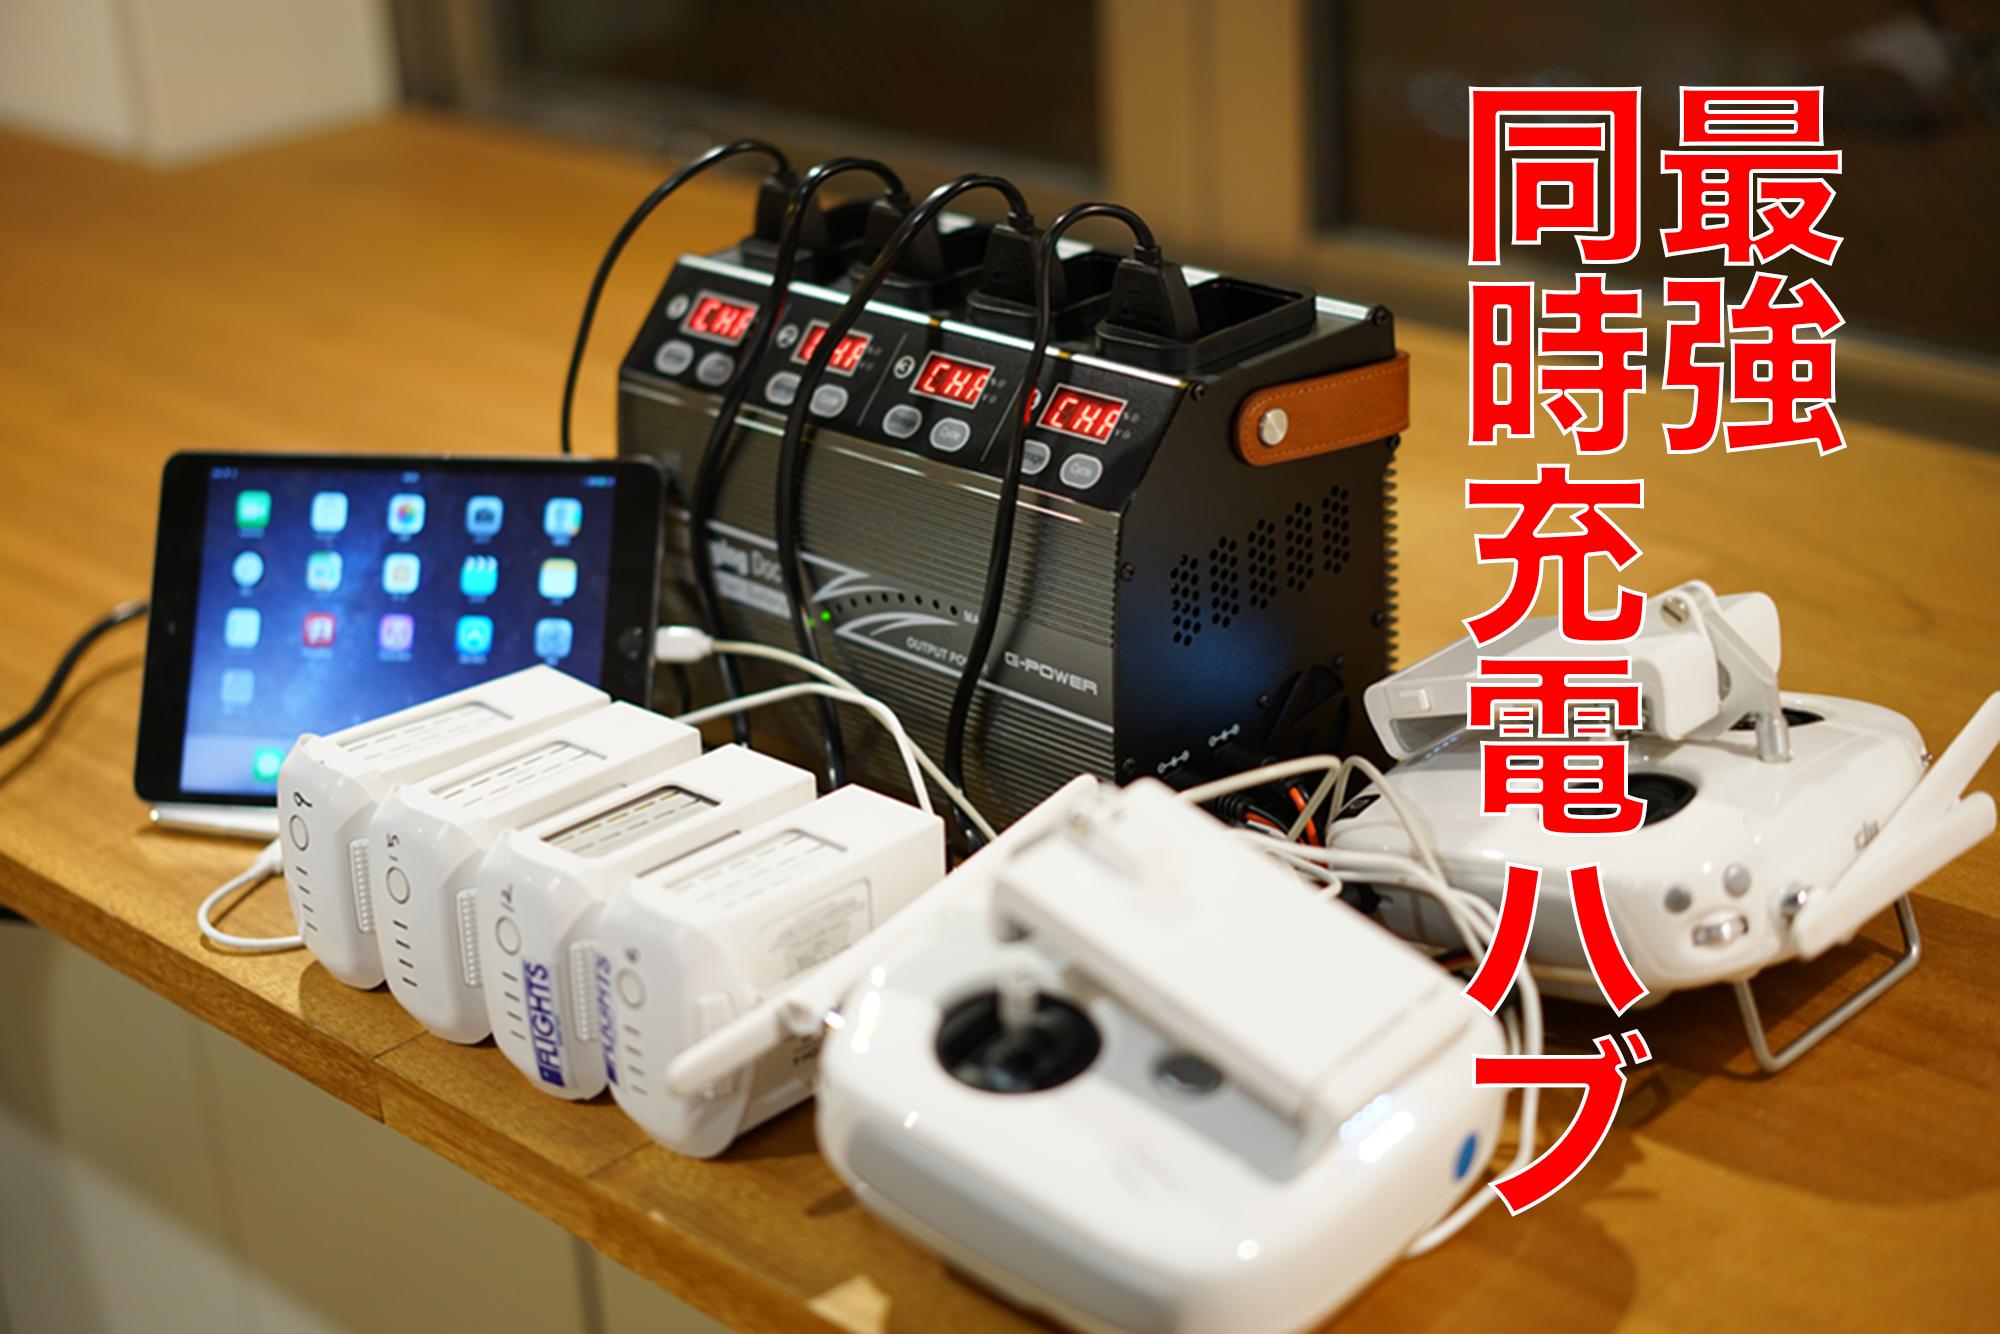 Phantom4 Pro対応の充電ハブをレビュー、同時に充電できる凄さ